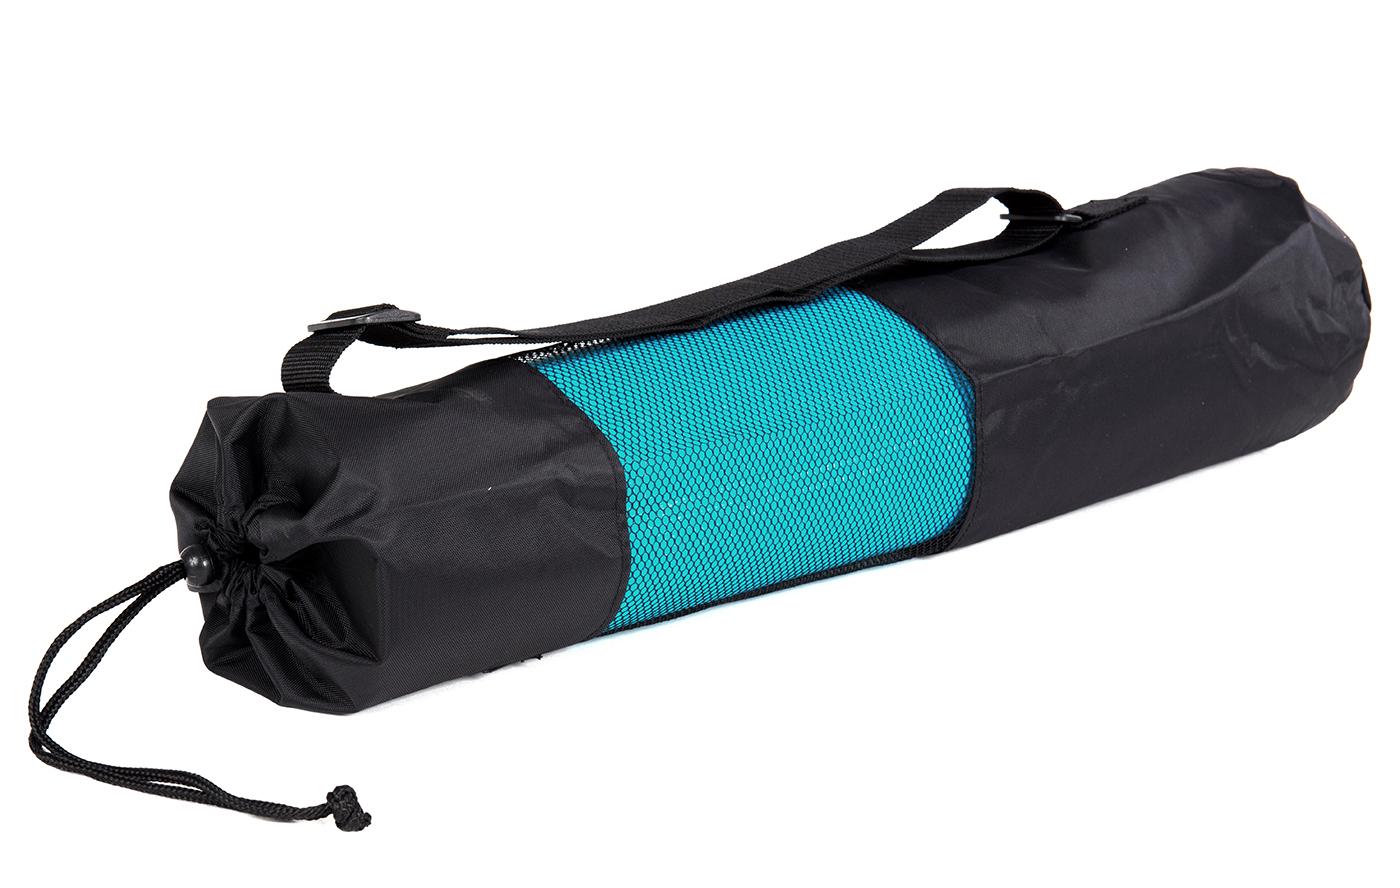 Yogatasche yogibag® basic - nylon net - 65 cm